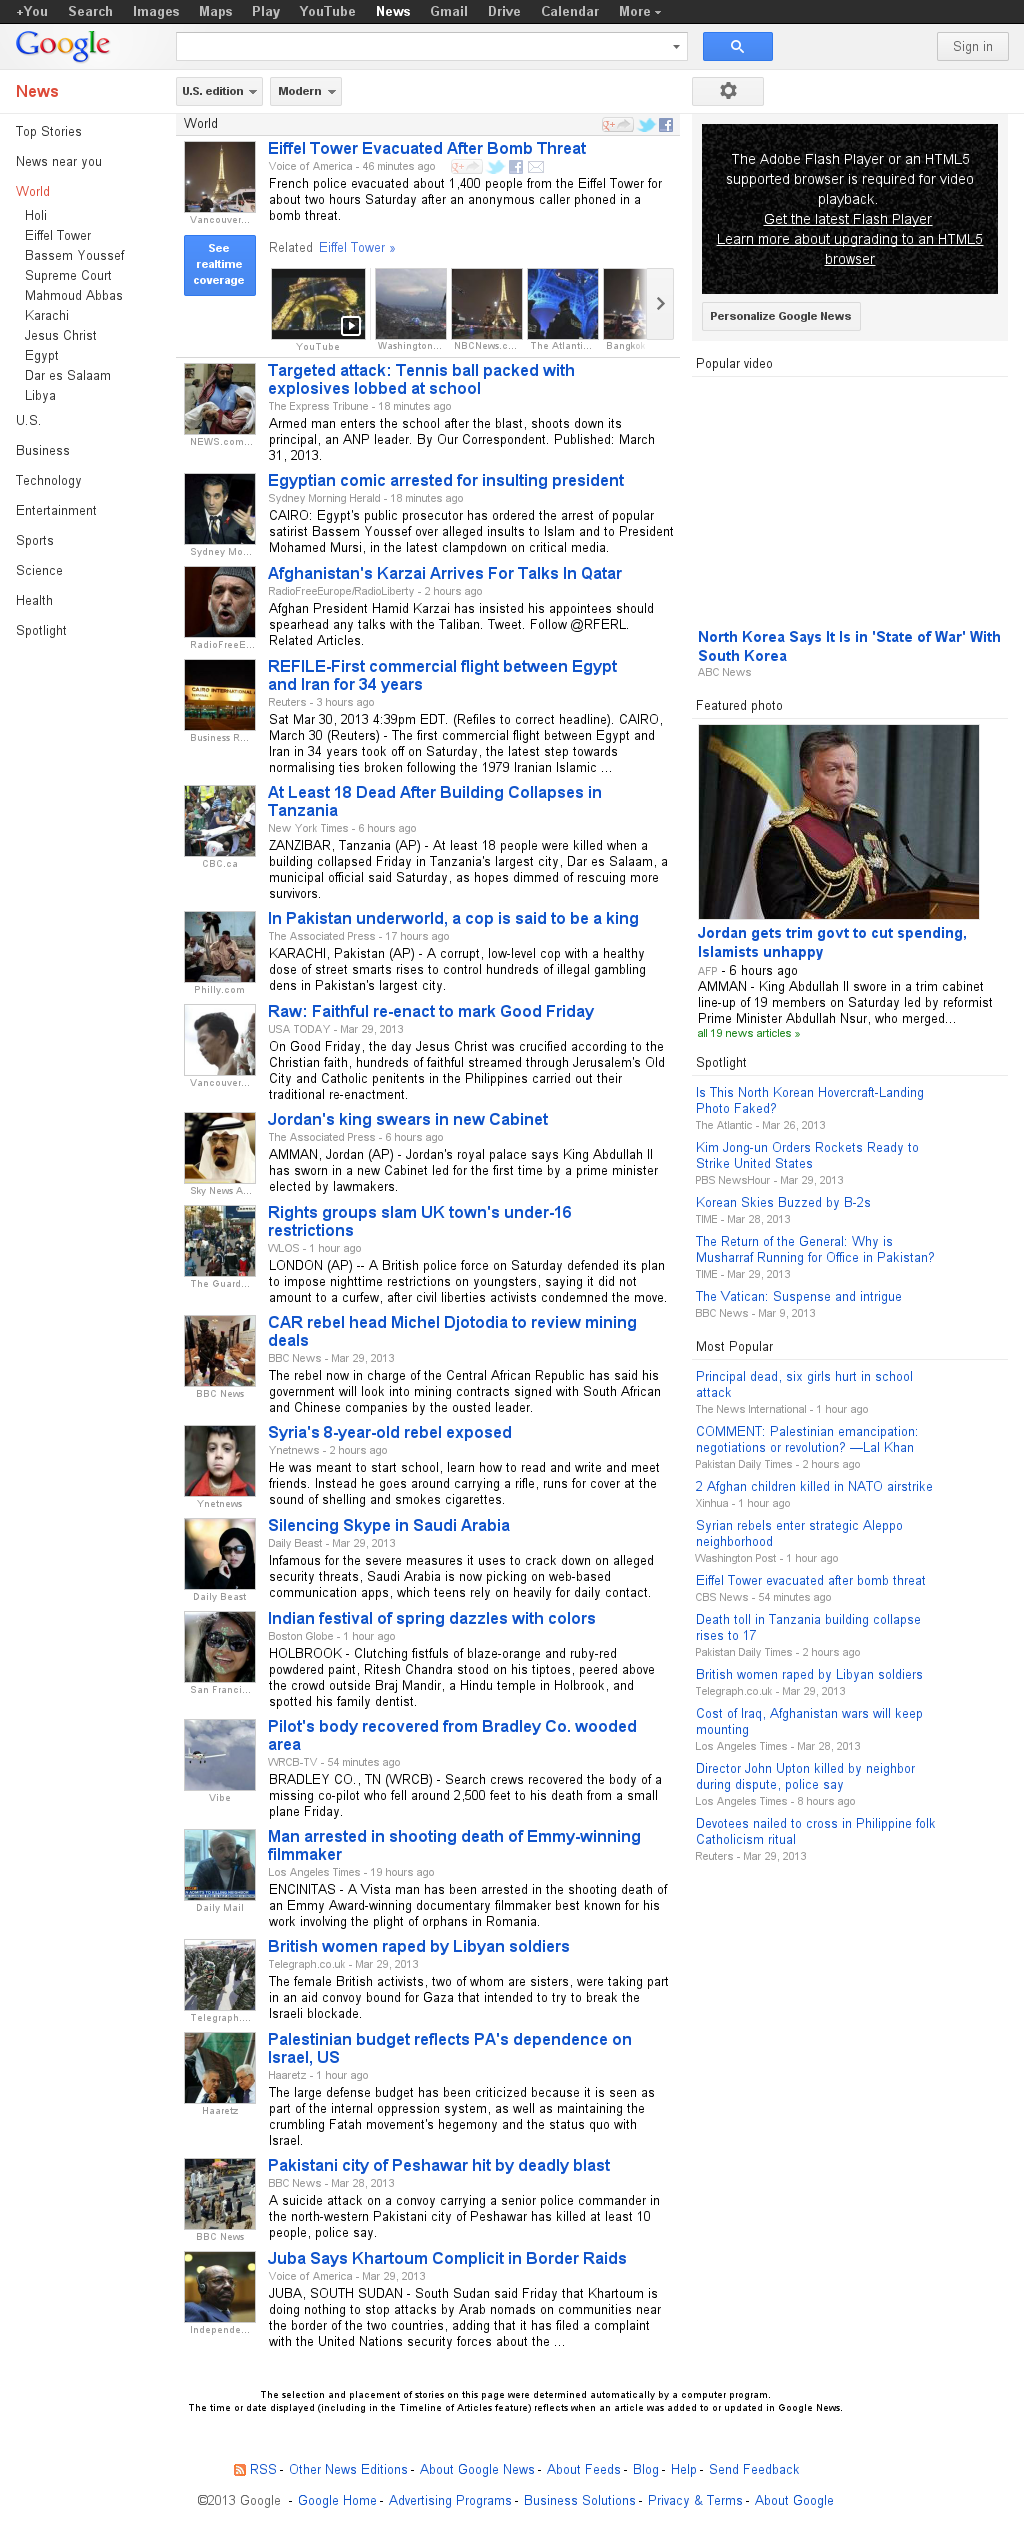 Google News: World at Sunday March 31, 2013, 12:08 a.m. UTC